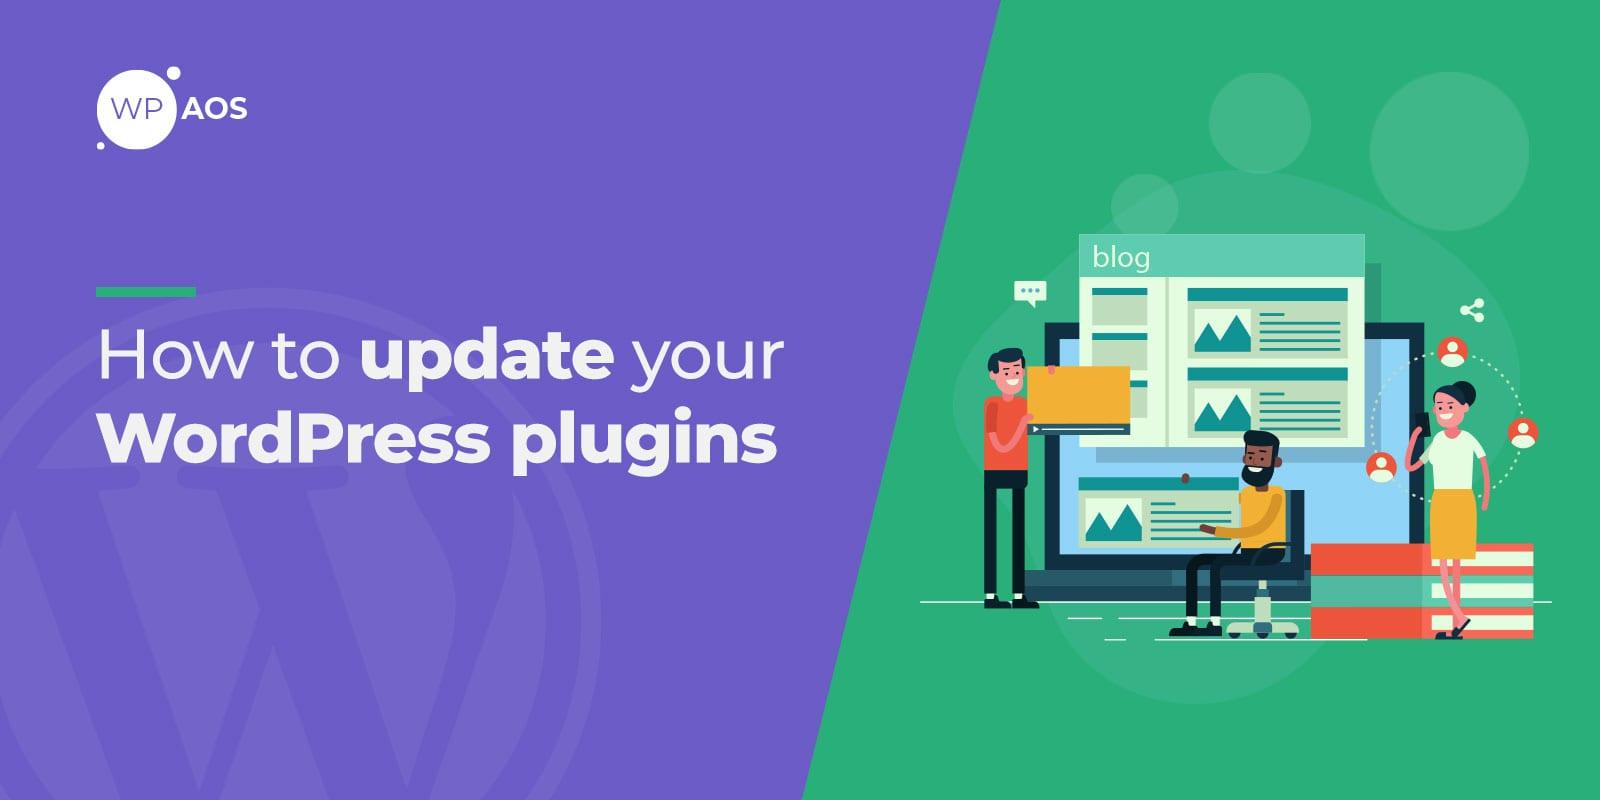 update wordpress plugins, wpaos